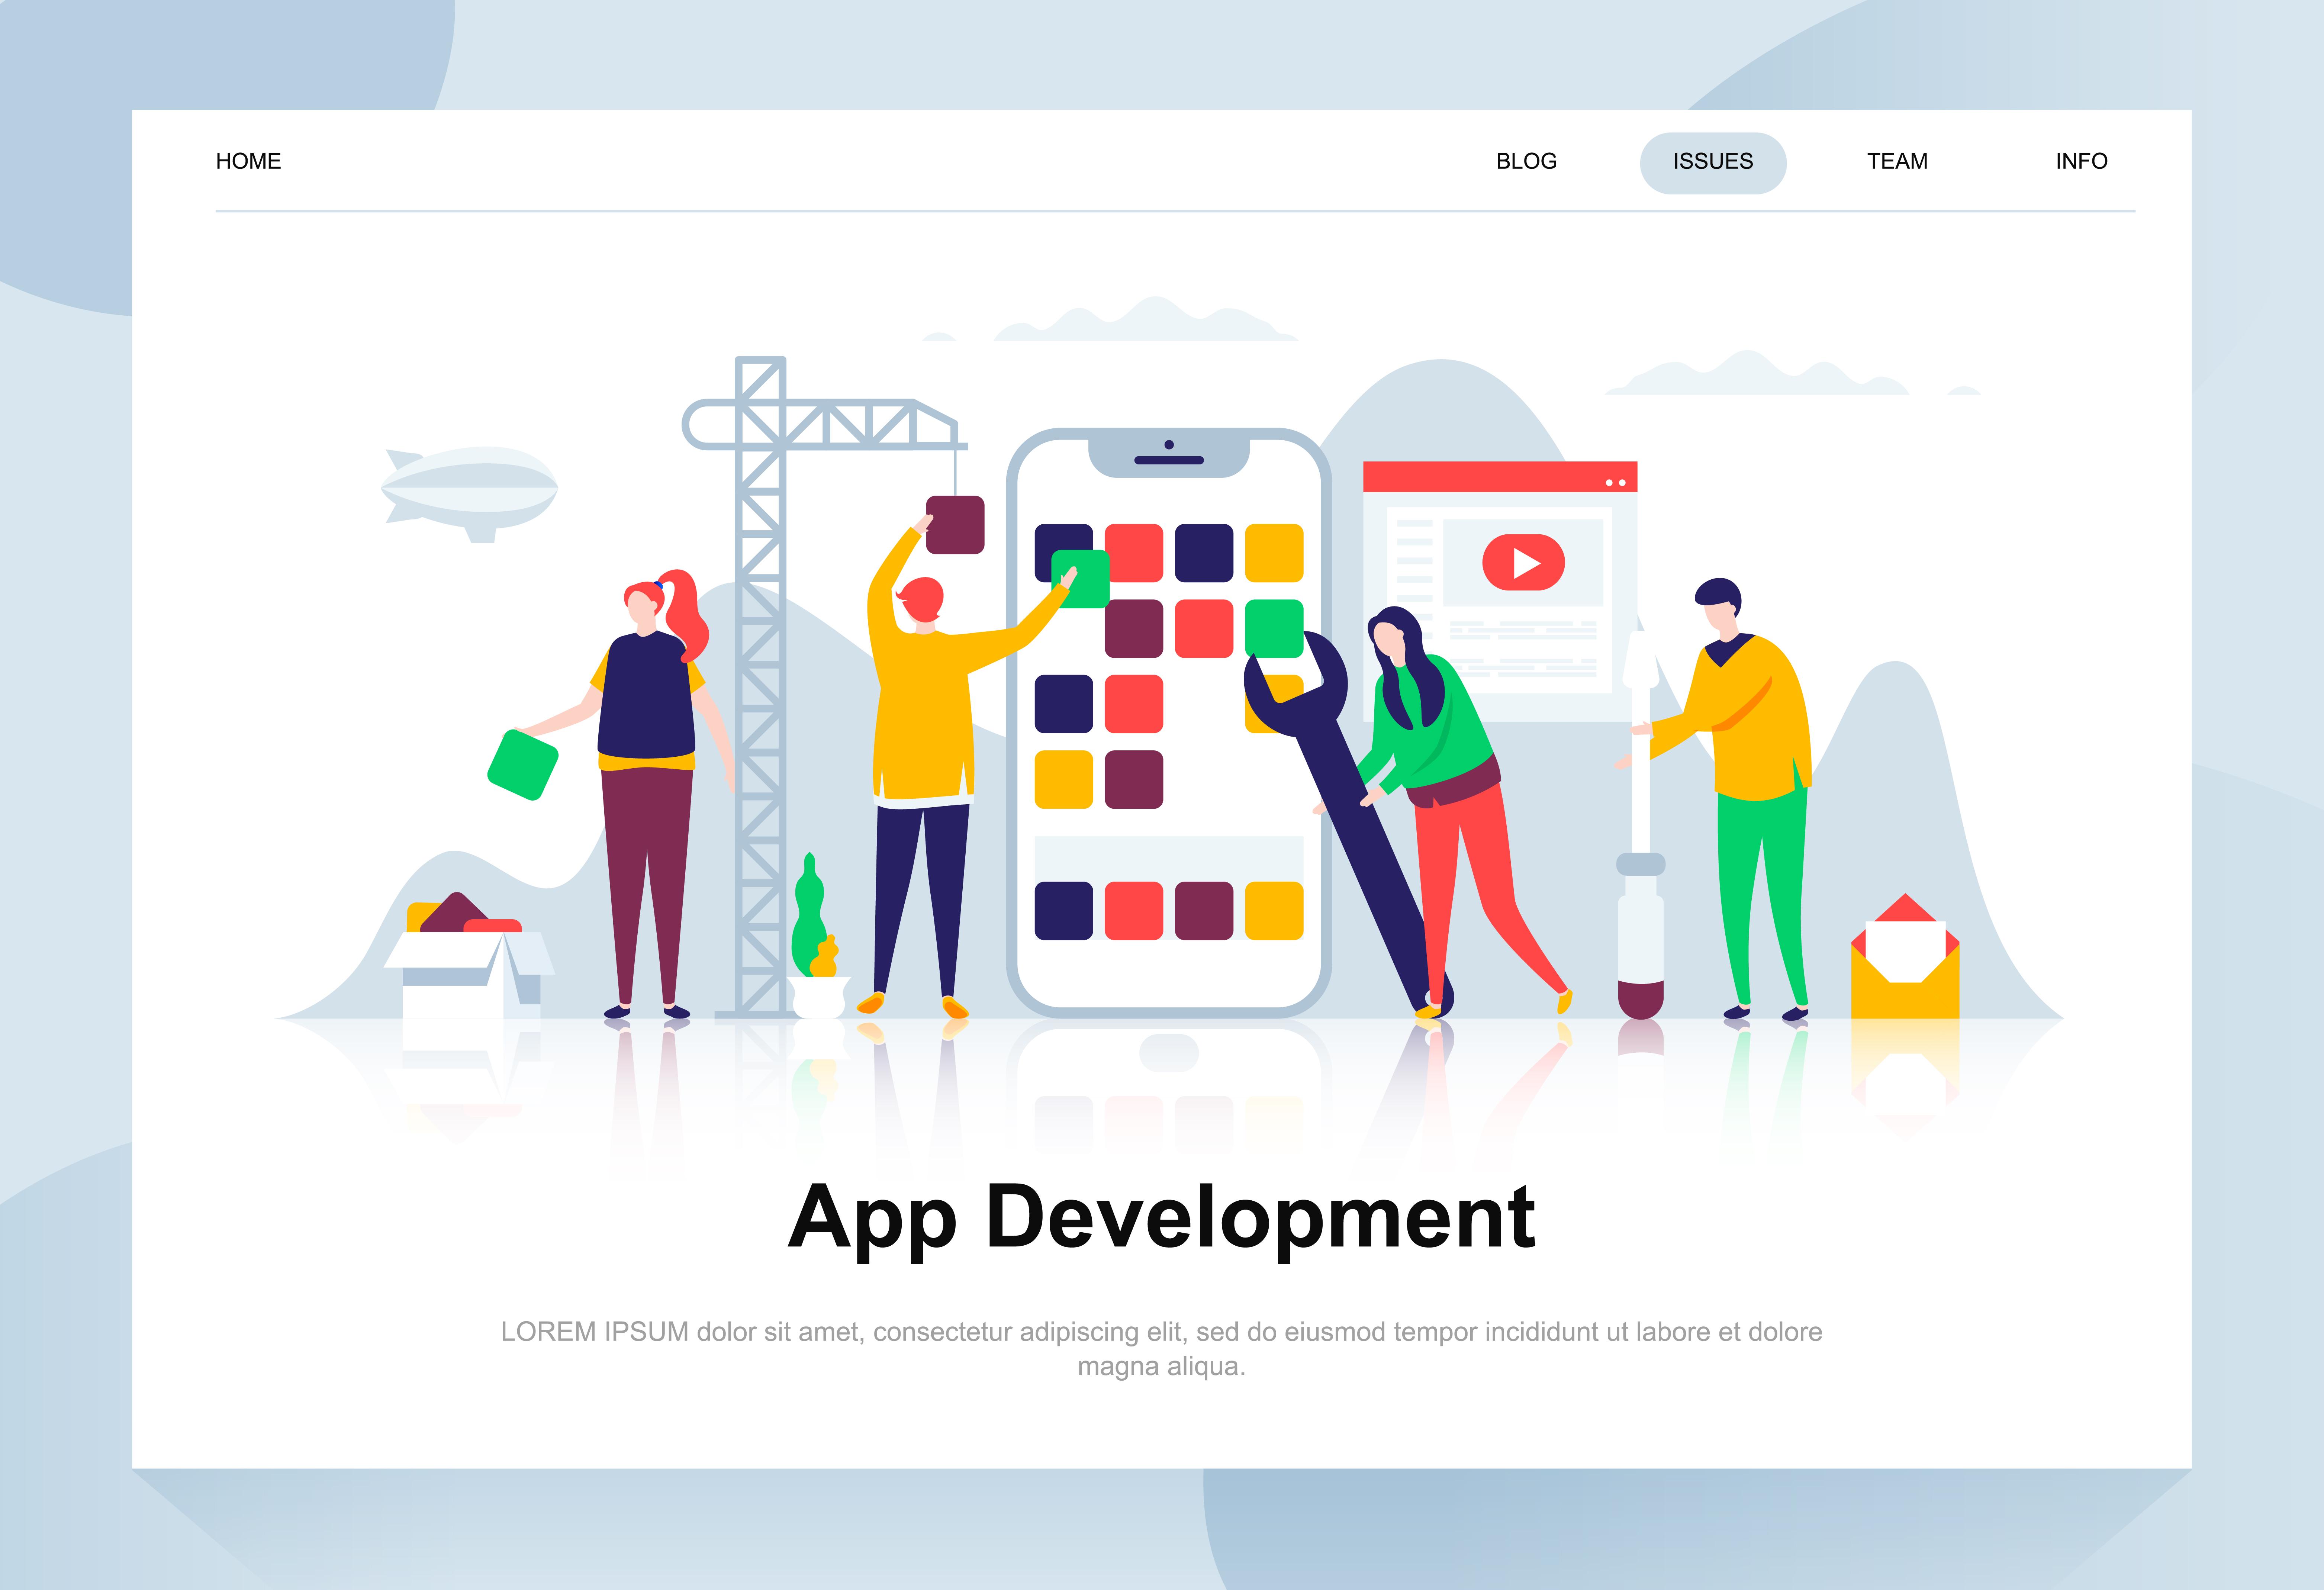 Vector Illustration Web Designs: App Development Modern Flat Design Concept